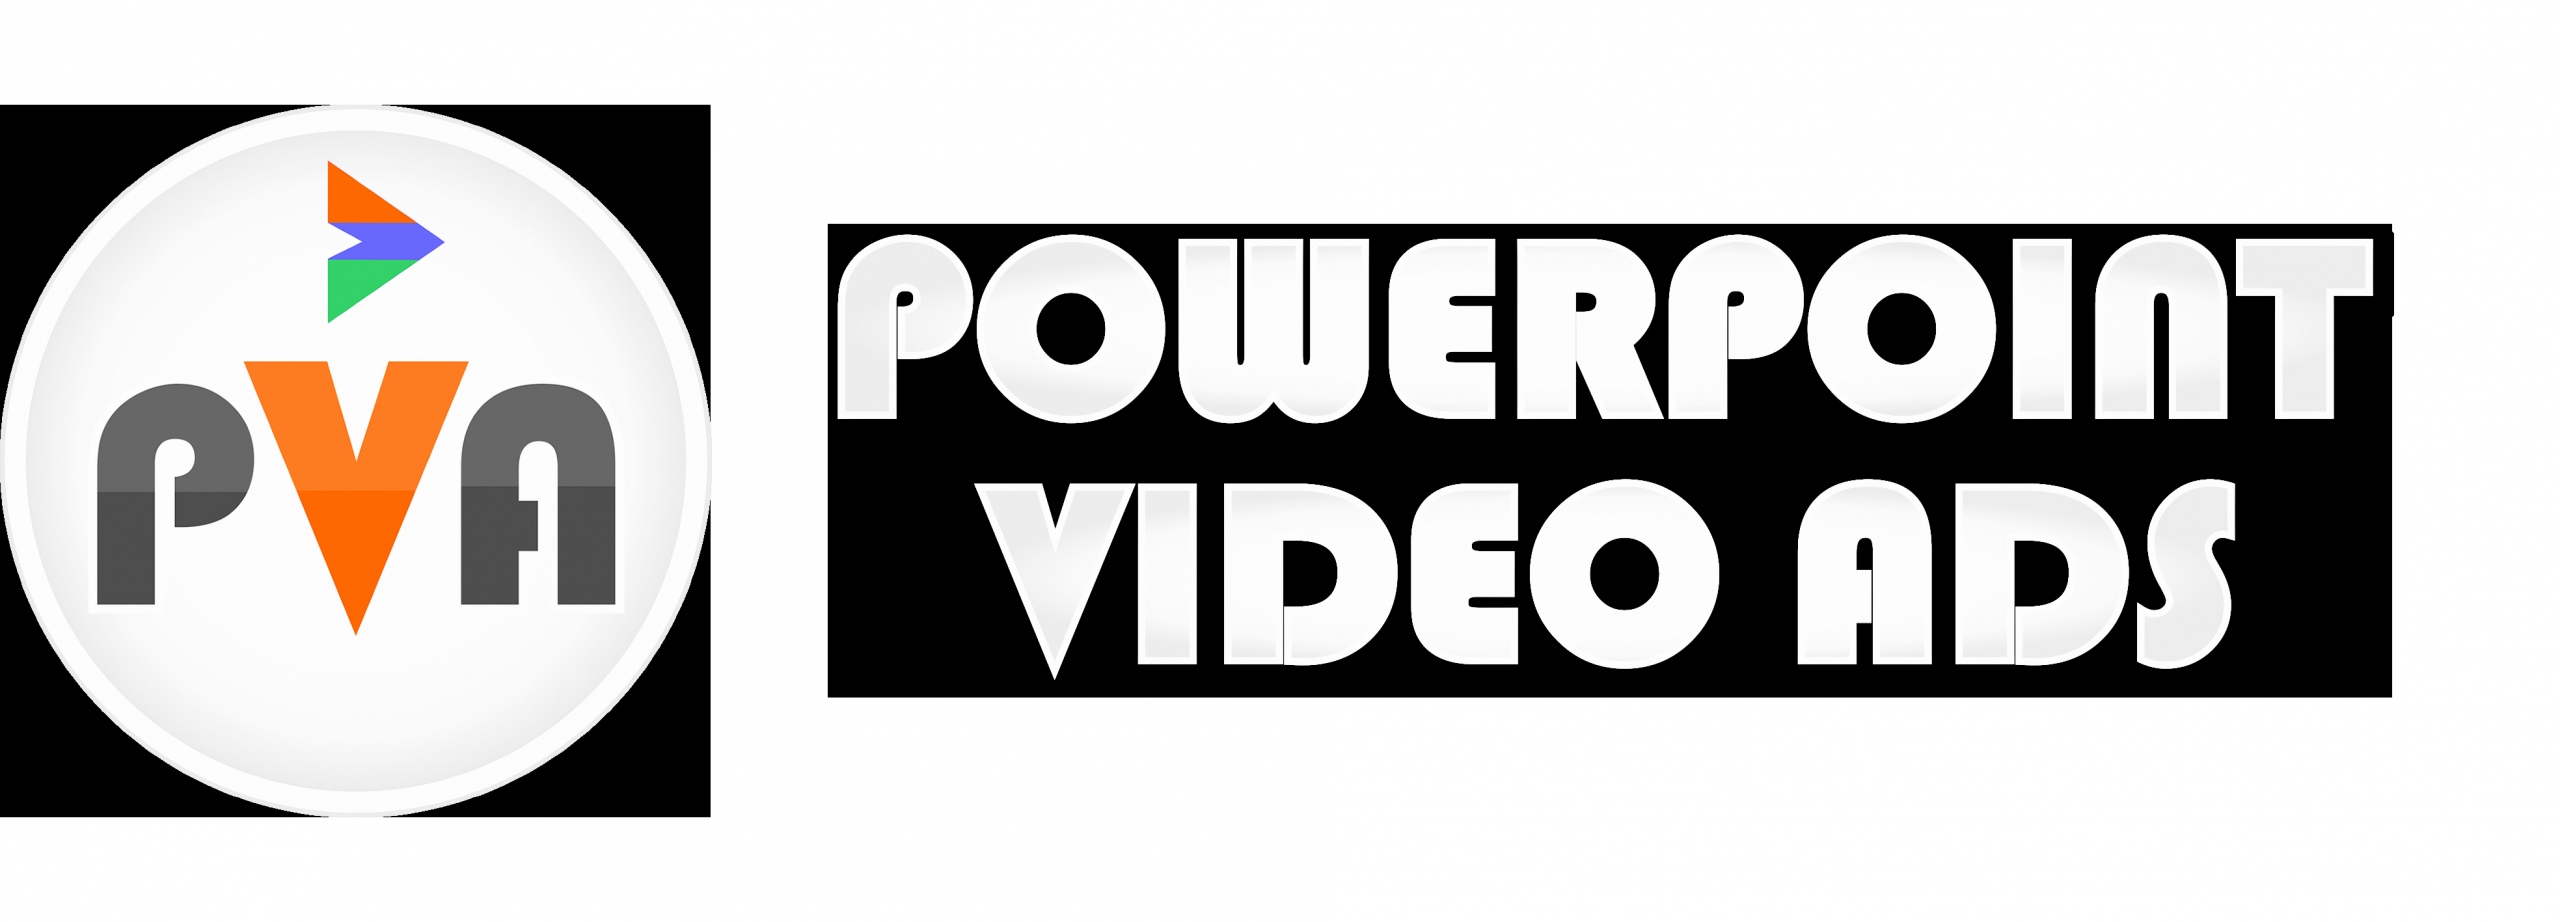 Menu Board Template Powerpoint Inspirational Powerpoint Video Ads Create Video Ads and Digital Menu